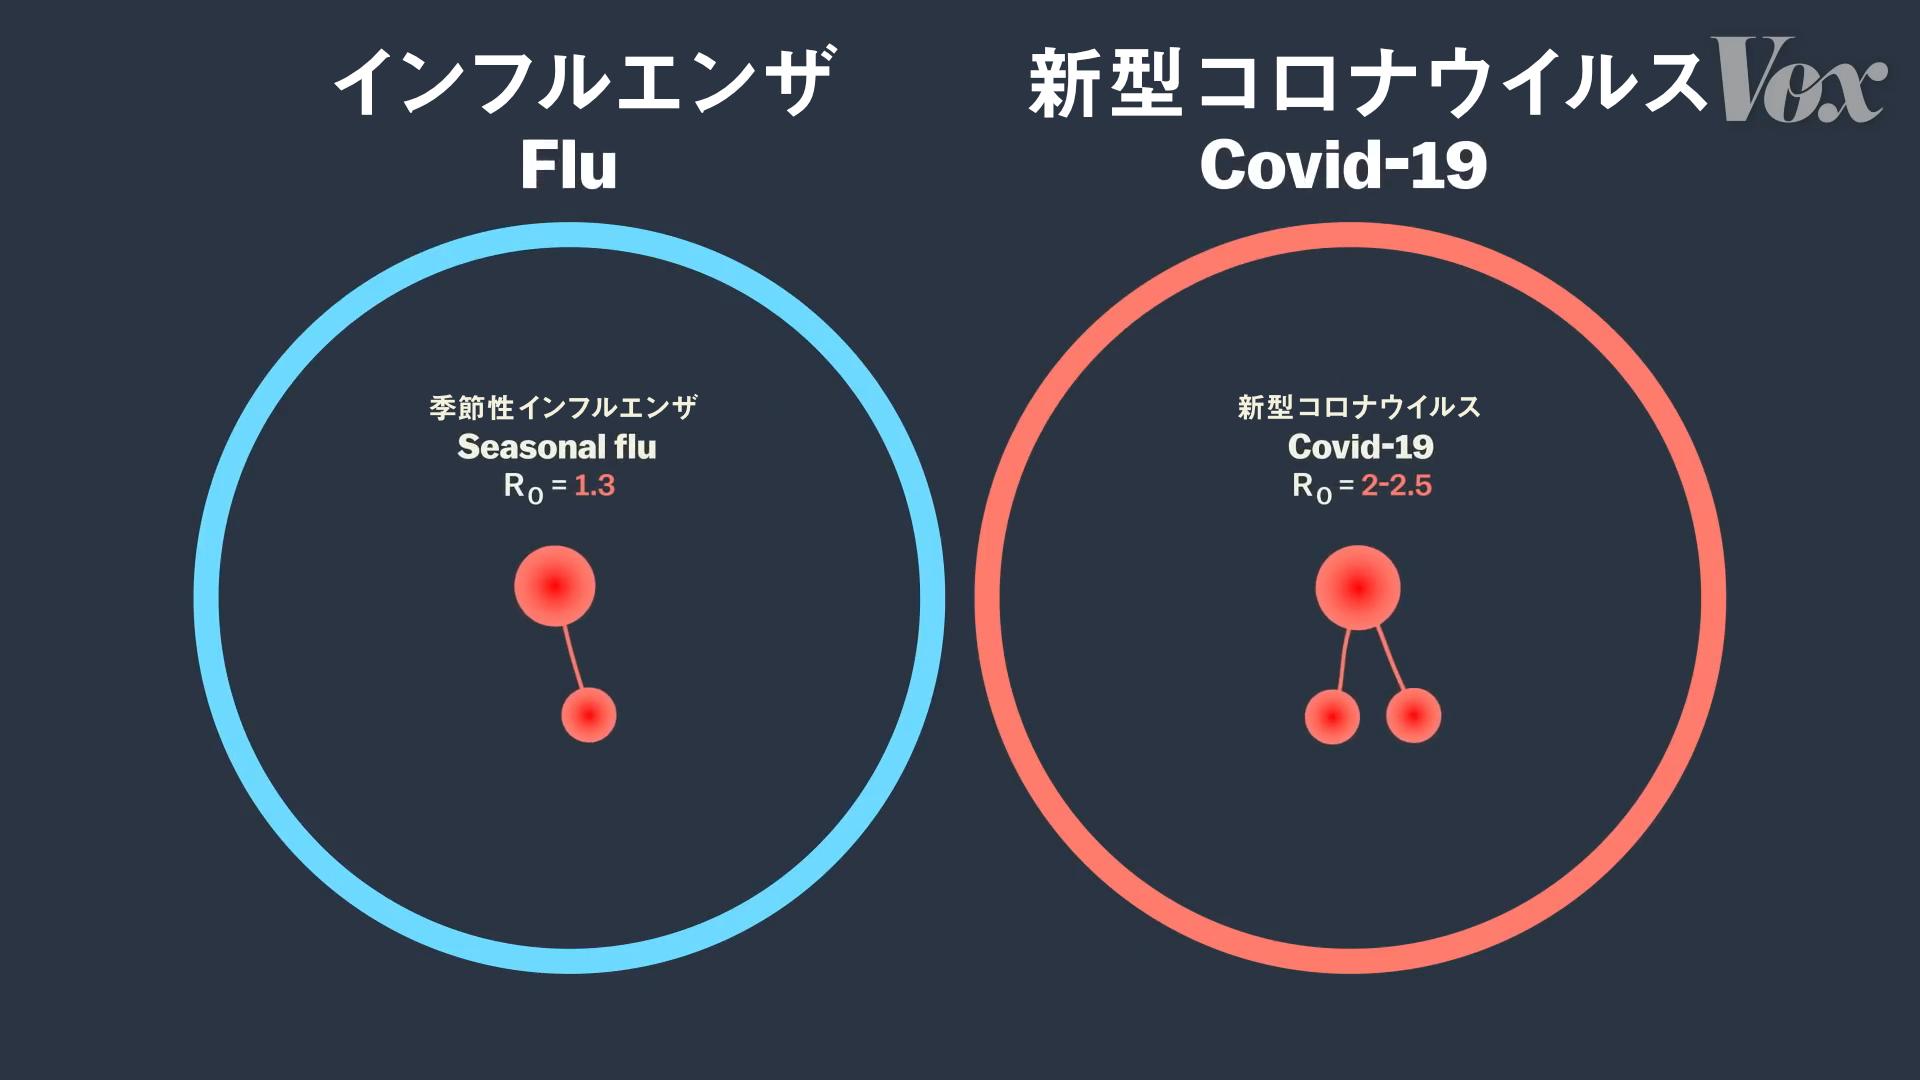 f:id:Imamura:20200408133102p:plain